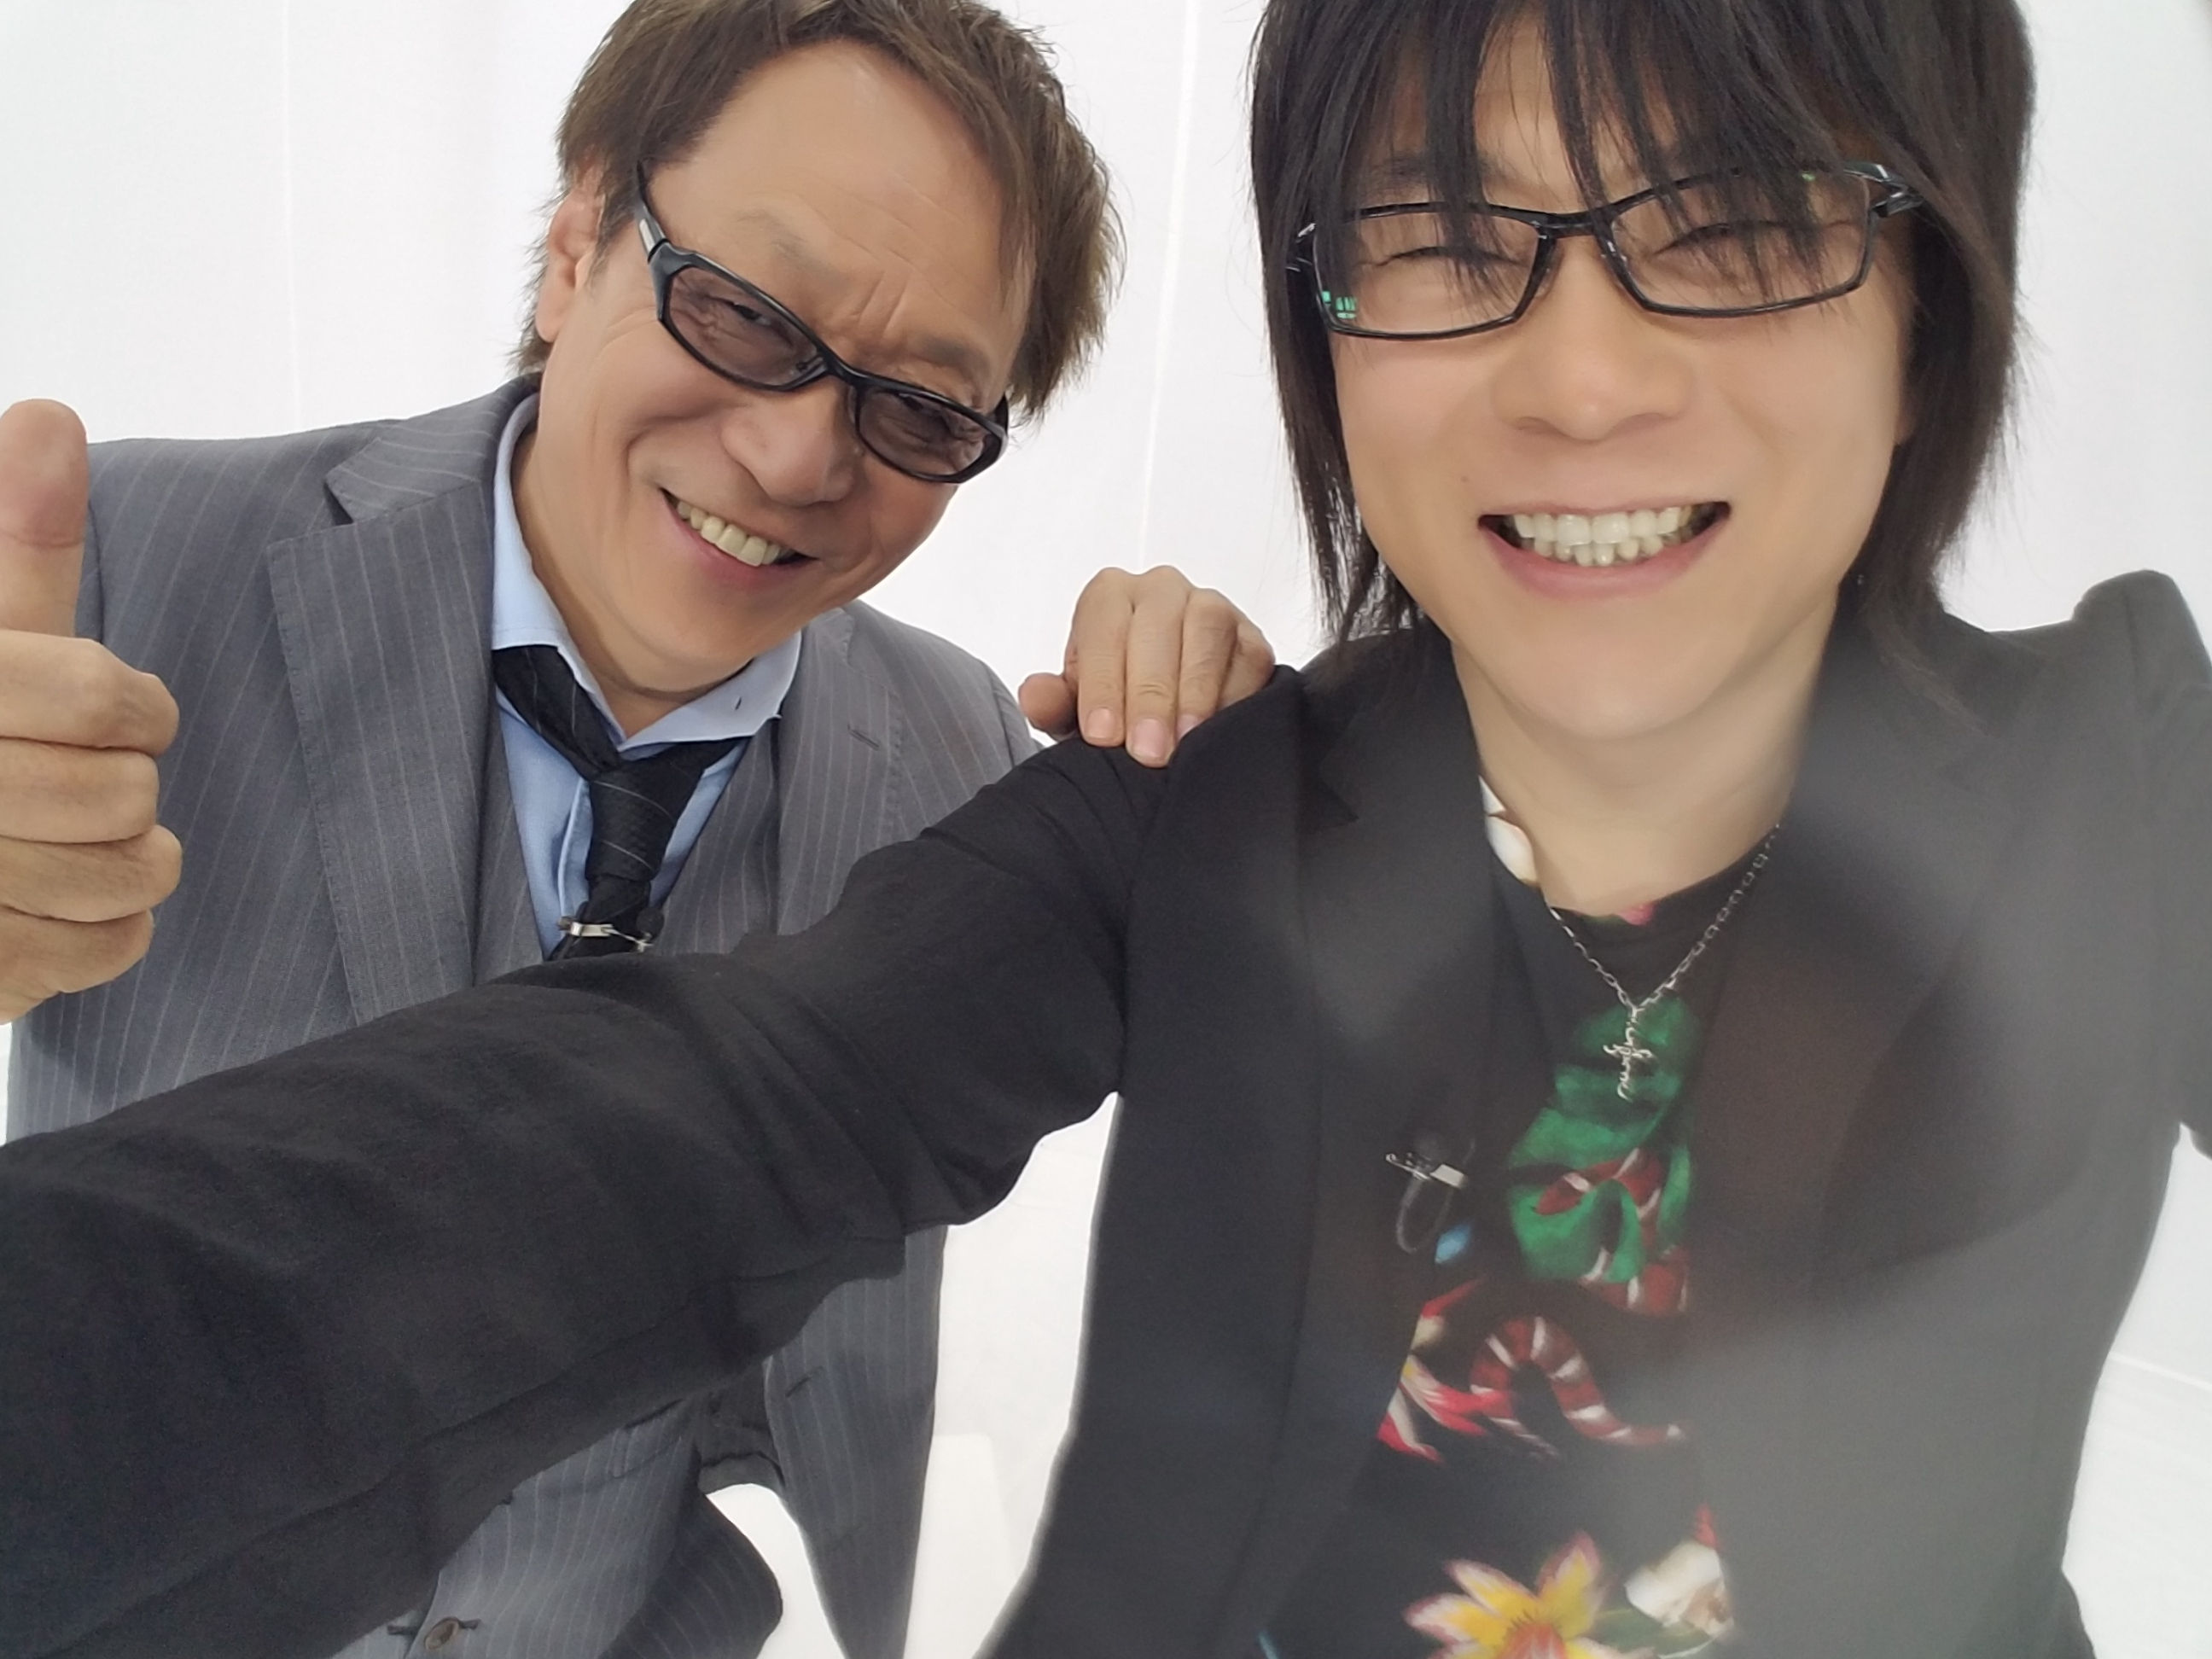 hm2014新款秋装_nichika_kitamura - www.ggxx5.com